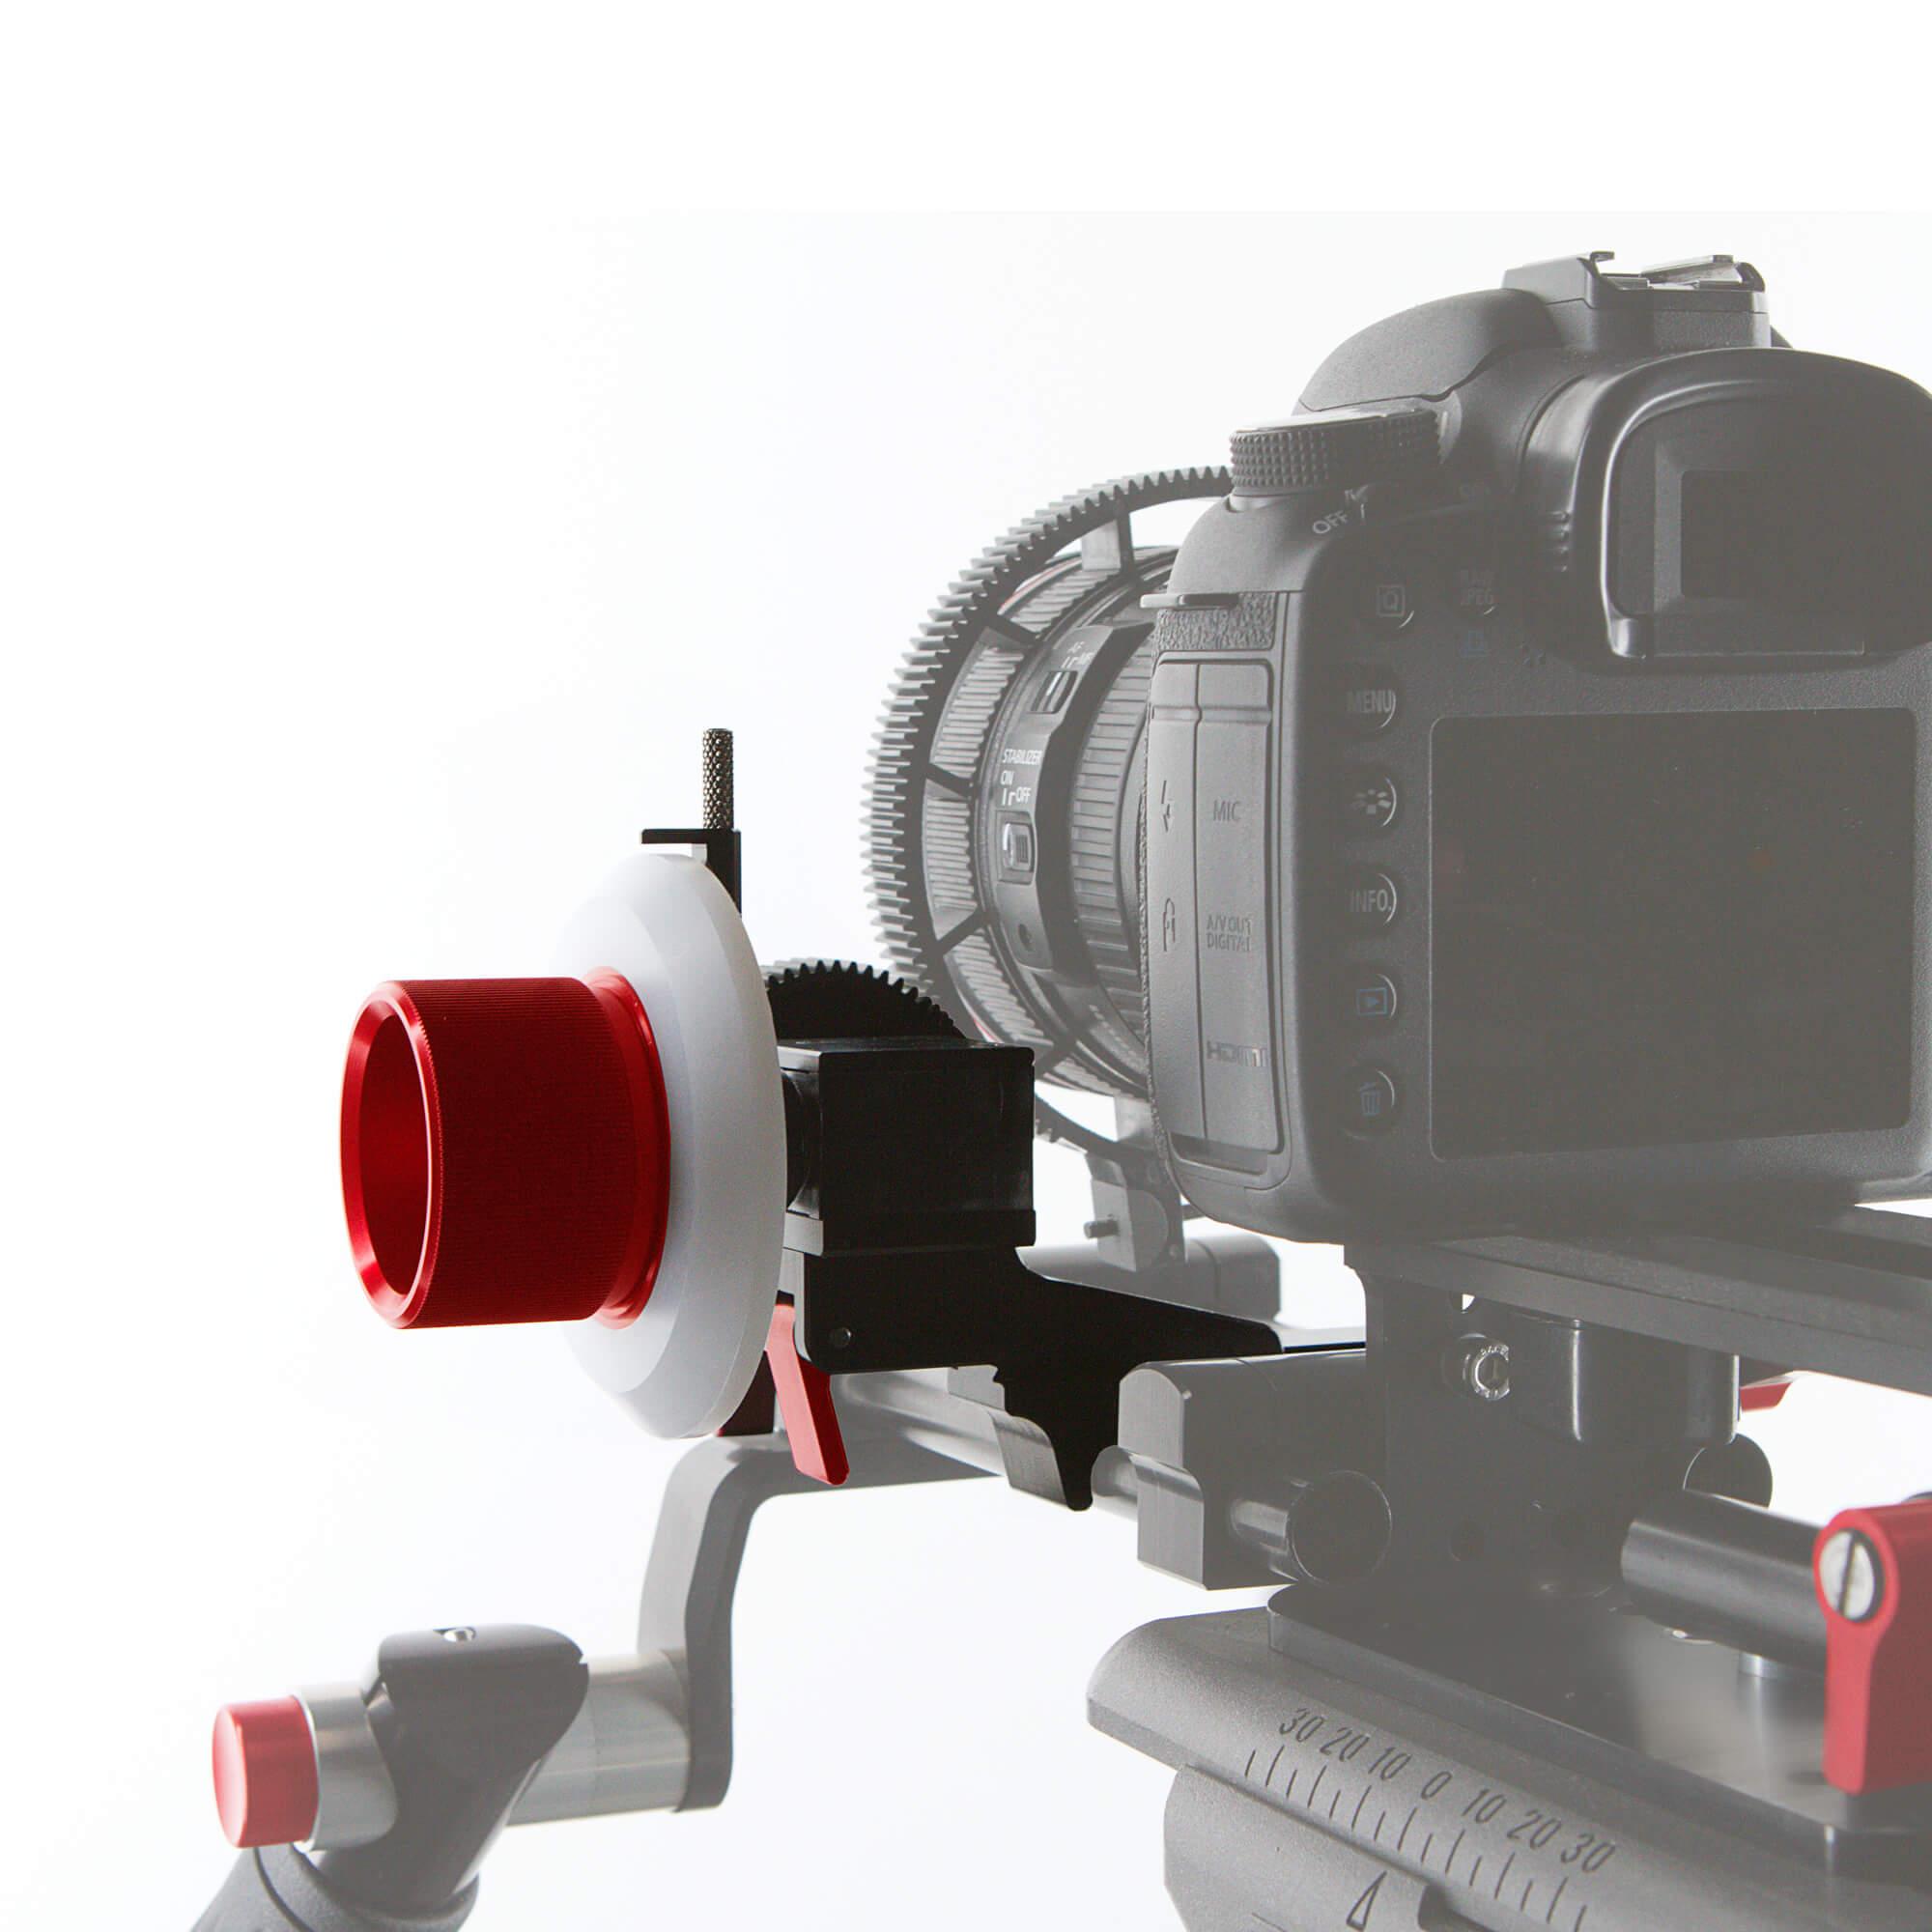 Follow Focus Friction Gear Clic